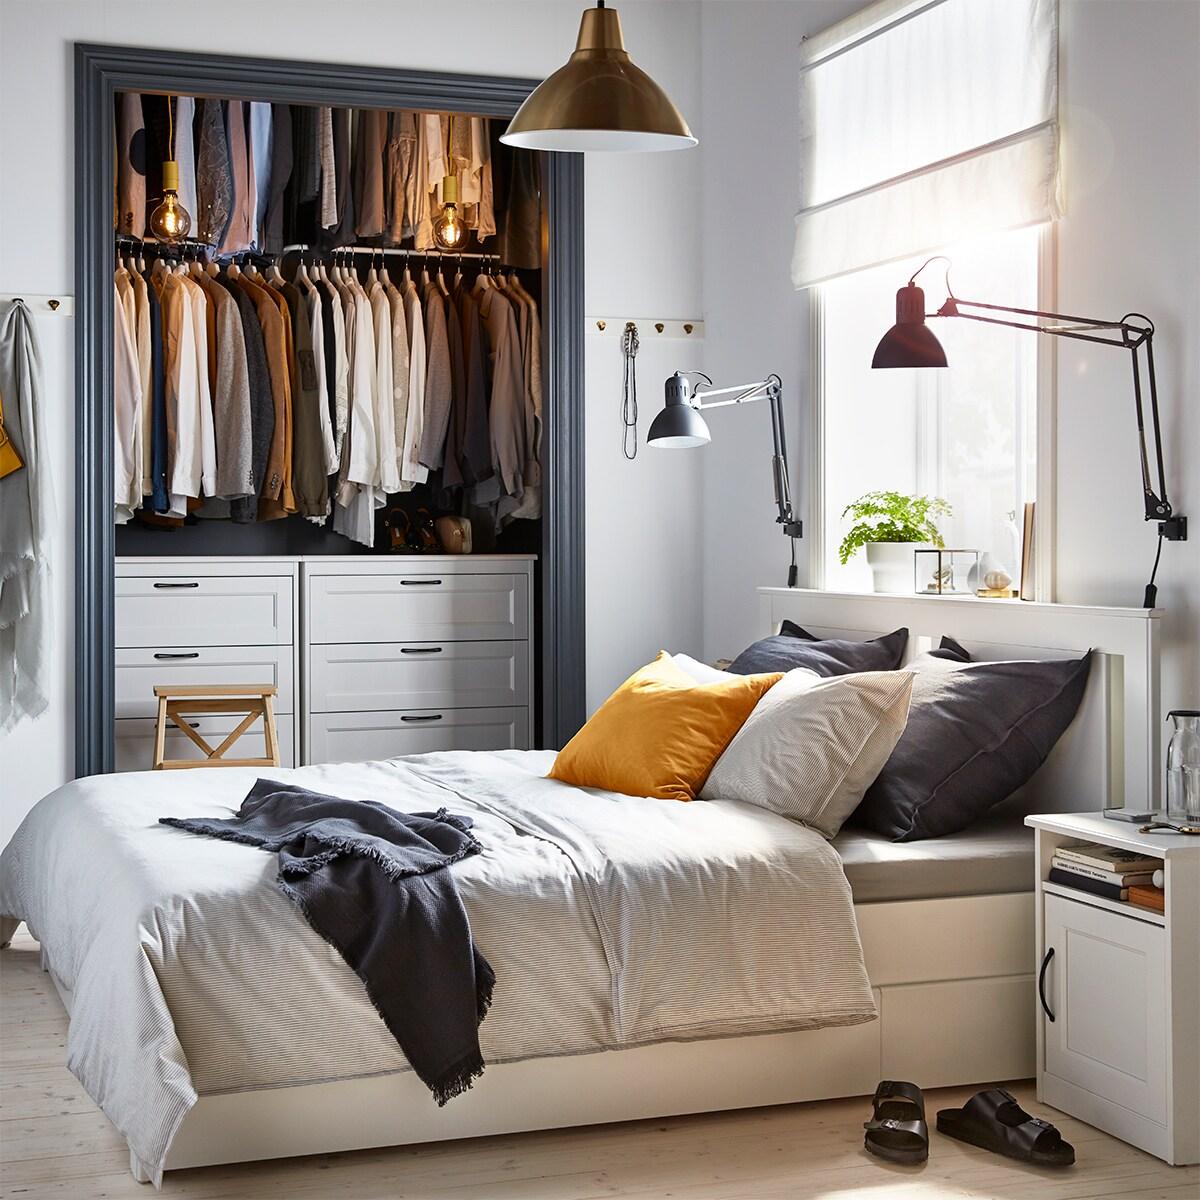 Idees D Ameublement Pour Ta Chambre Ikea Ikea Suisse